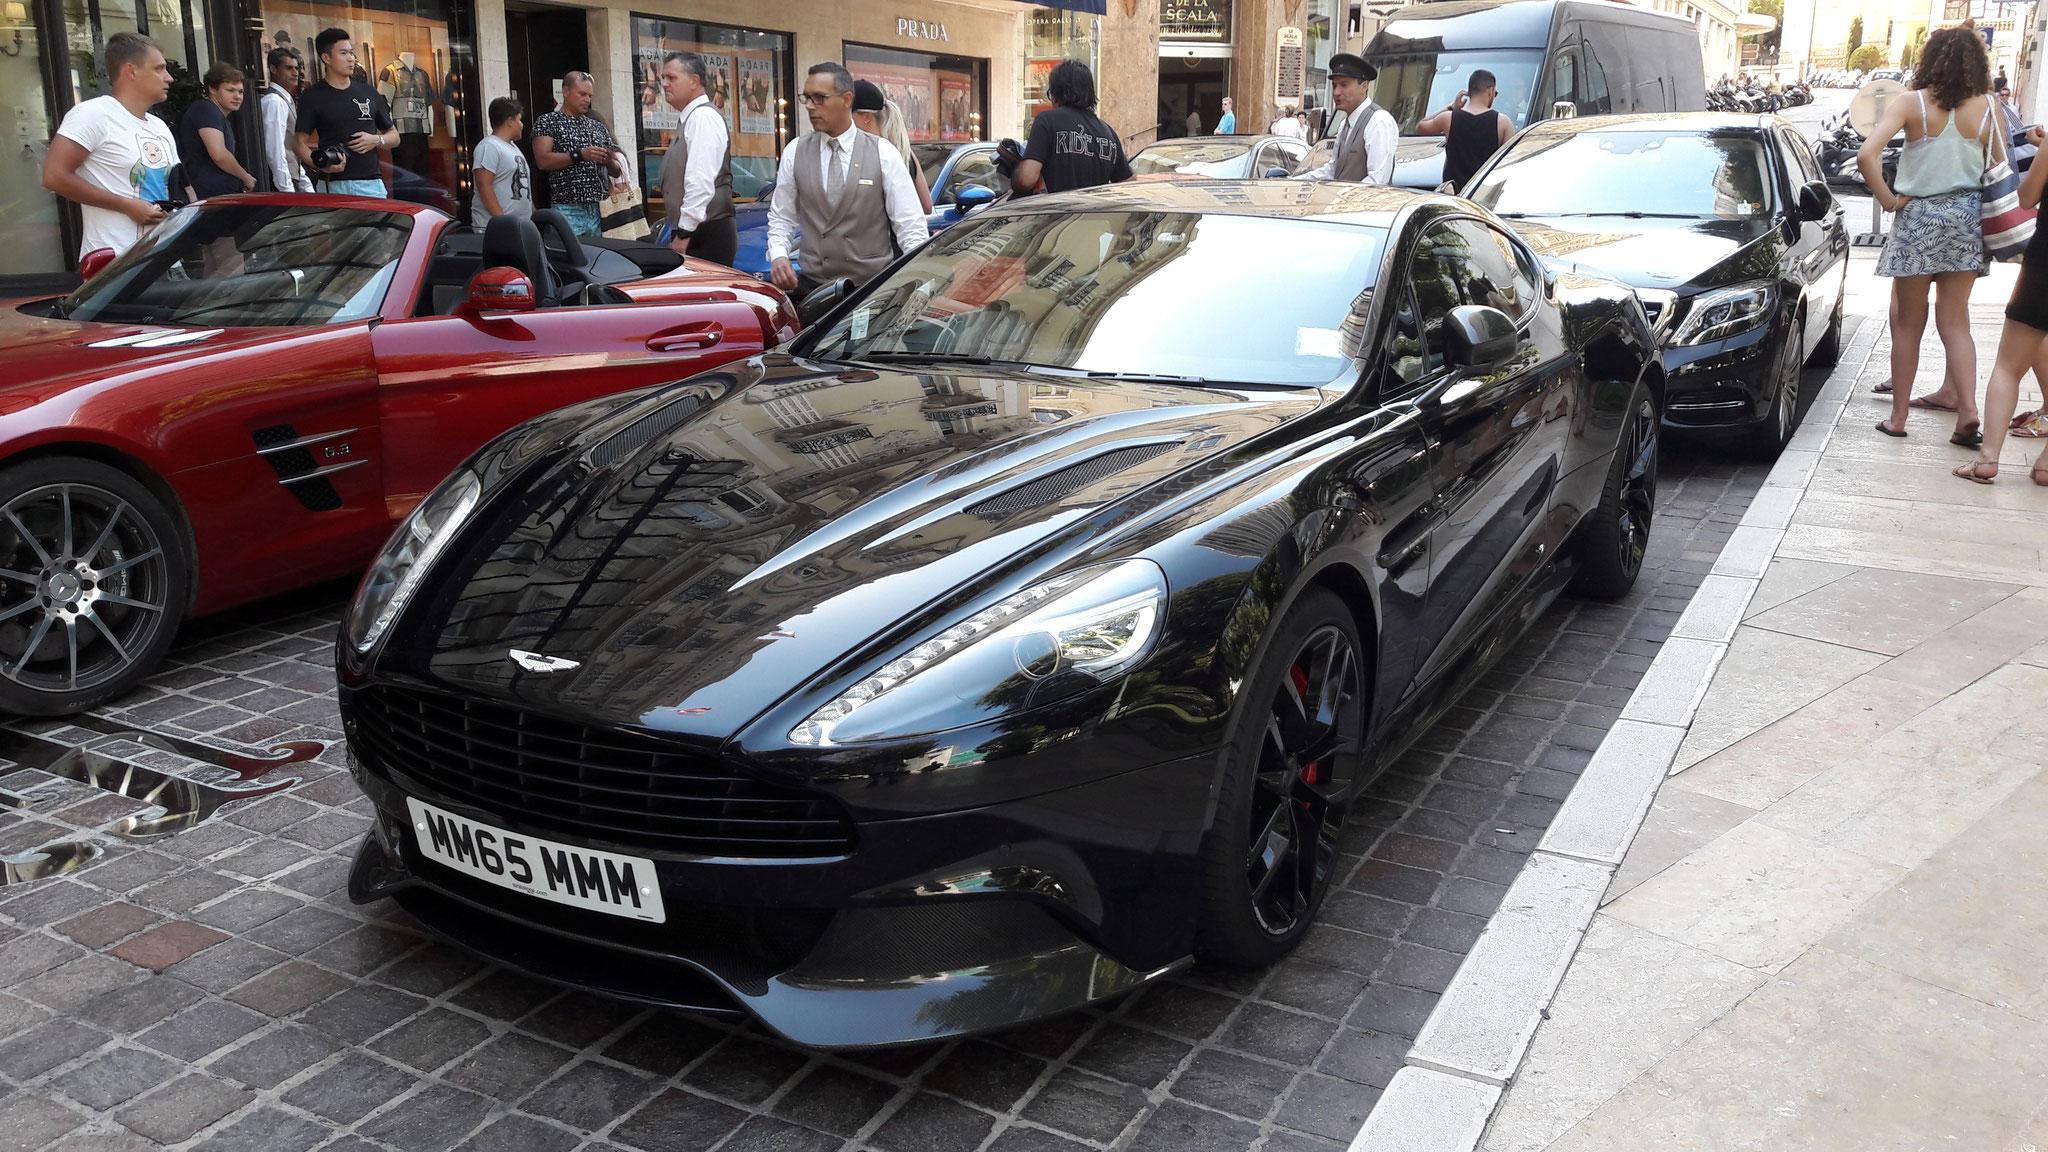 Aston Martin Vanquish - MM65-MMM (GB)